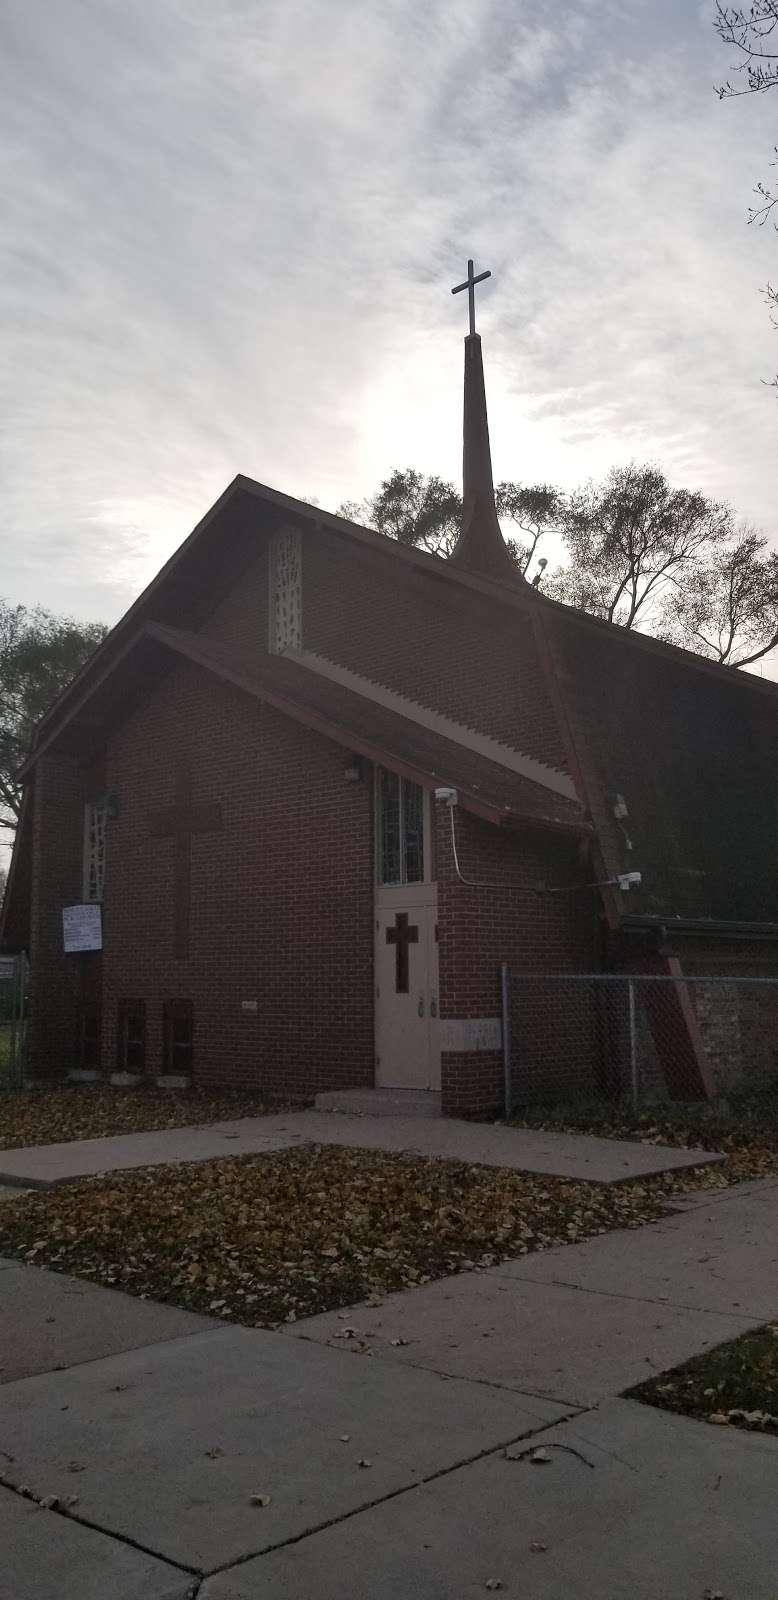 Mount Sinai Missionary Baptist Church - church  | Photo 1 of 1 | Address: Chicago, IL 60617, USA